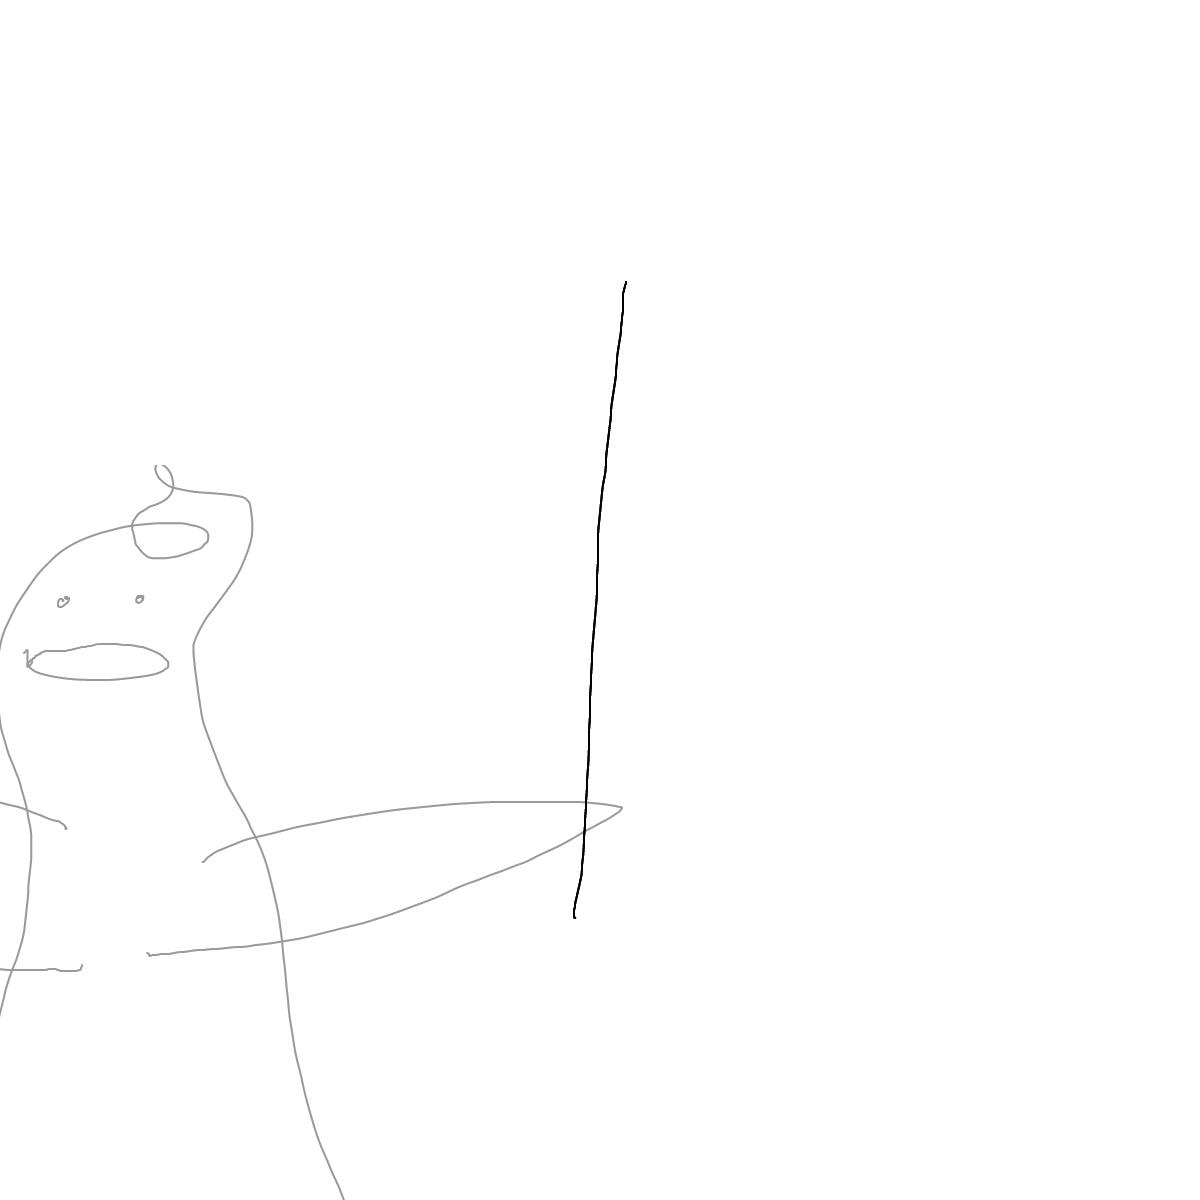 BAAAM drawing#10 lat:16.7474403381347660lng: -93.0832443237304700